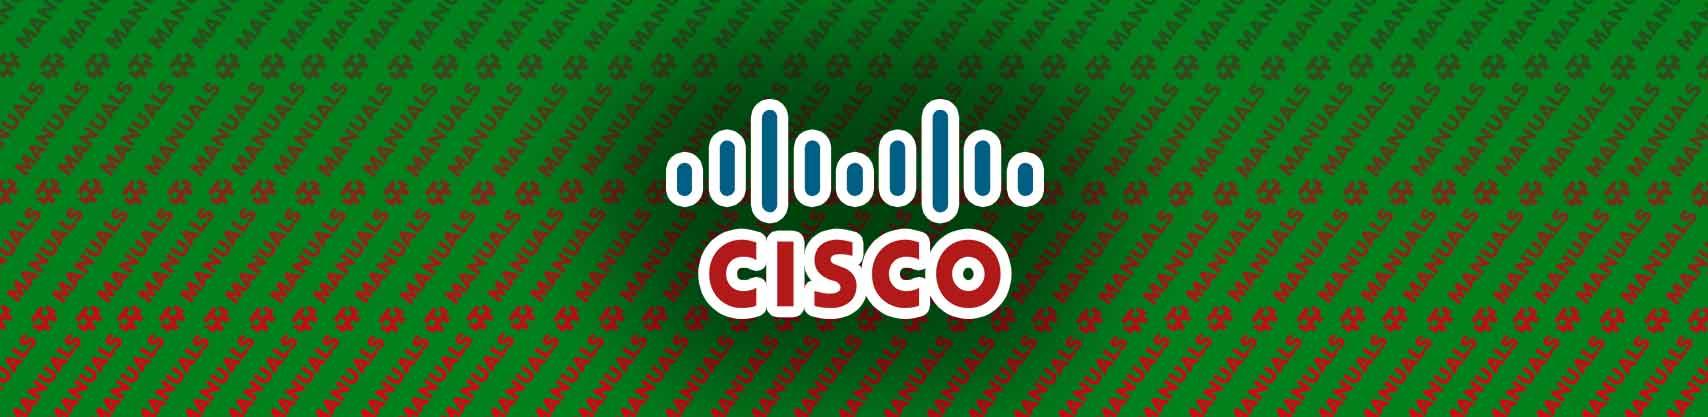 Cisco RE1000 Manual